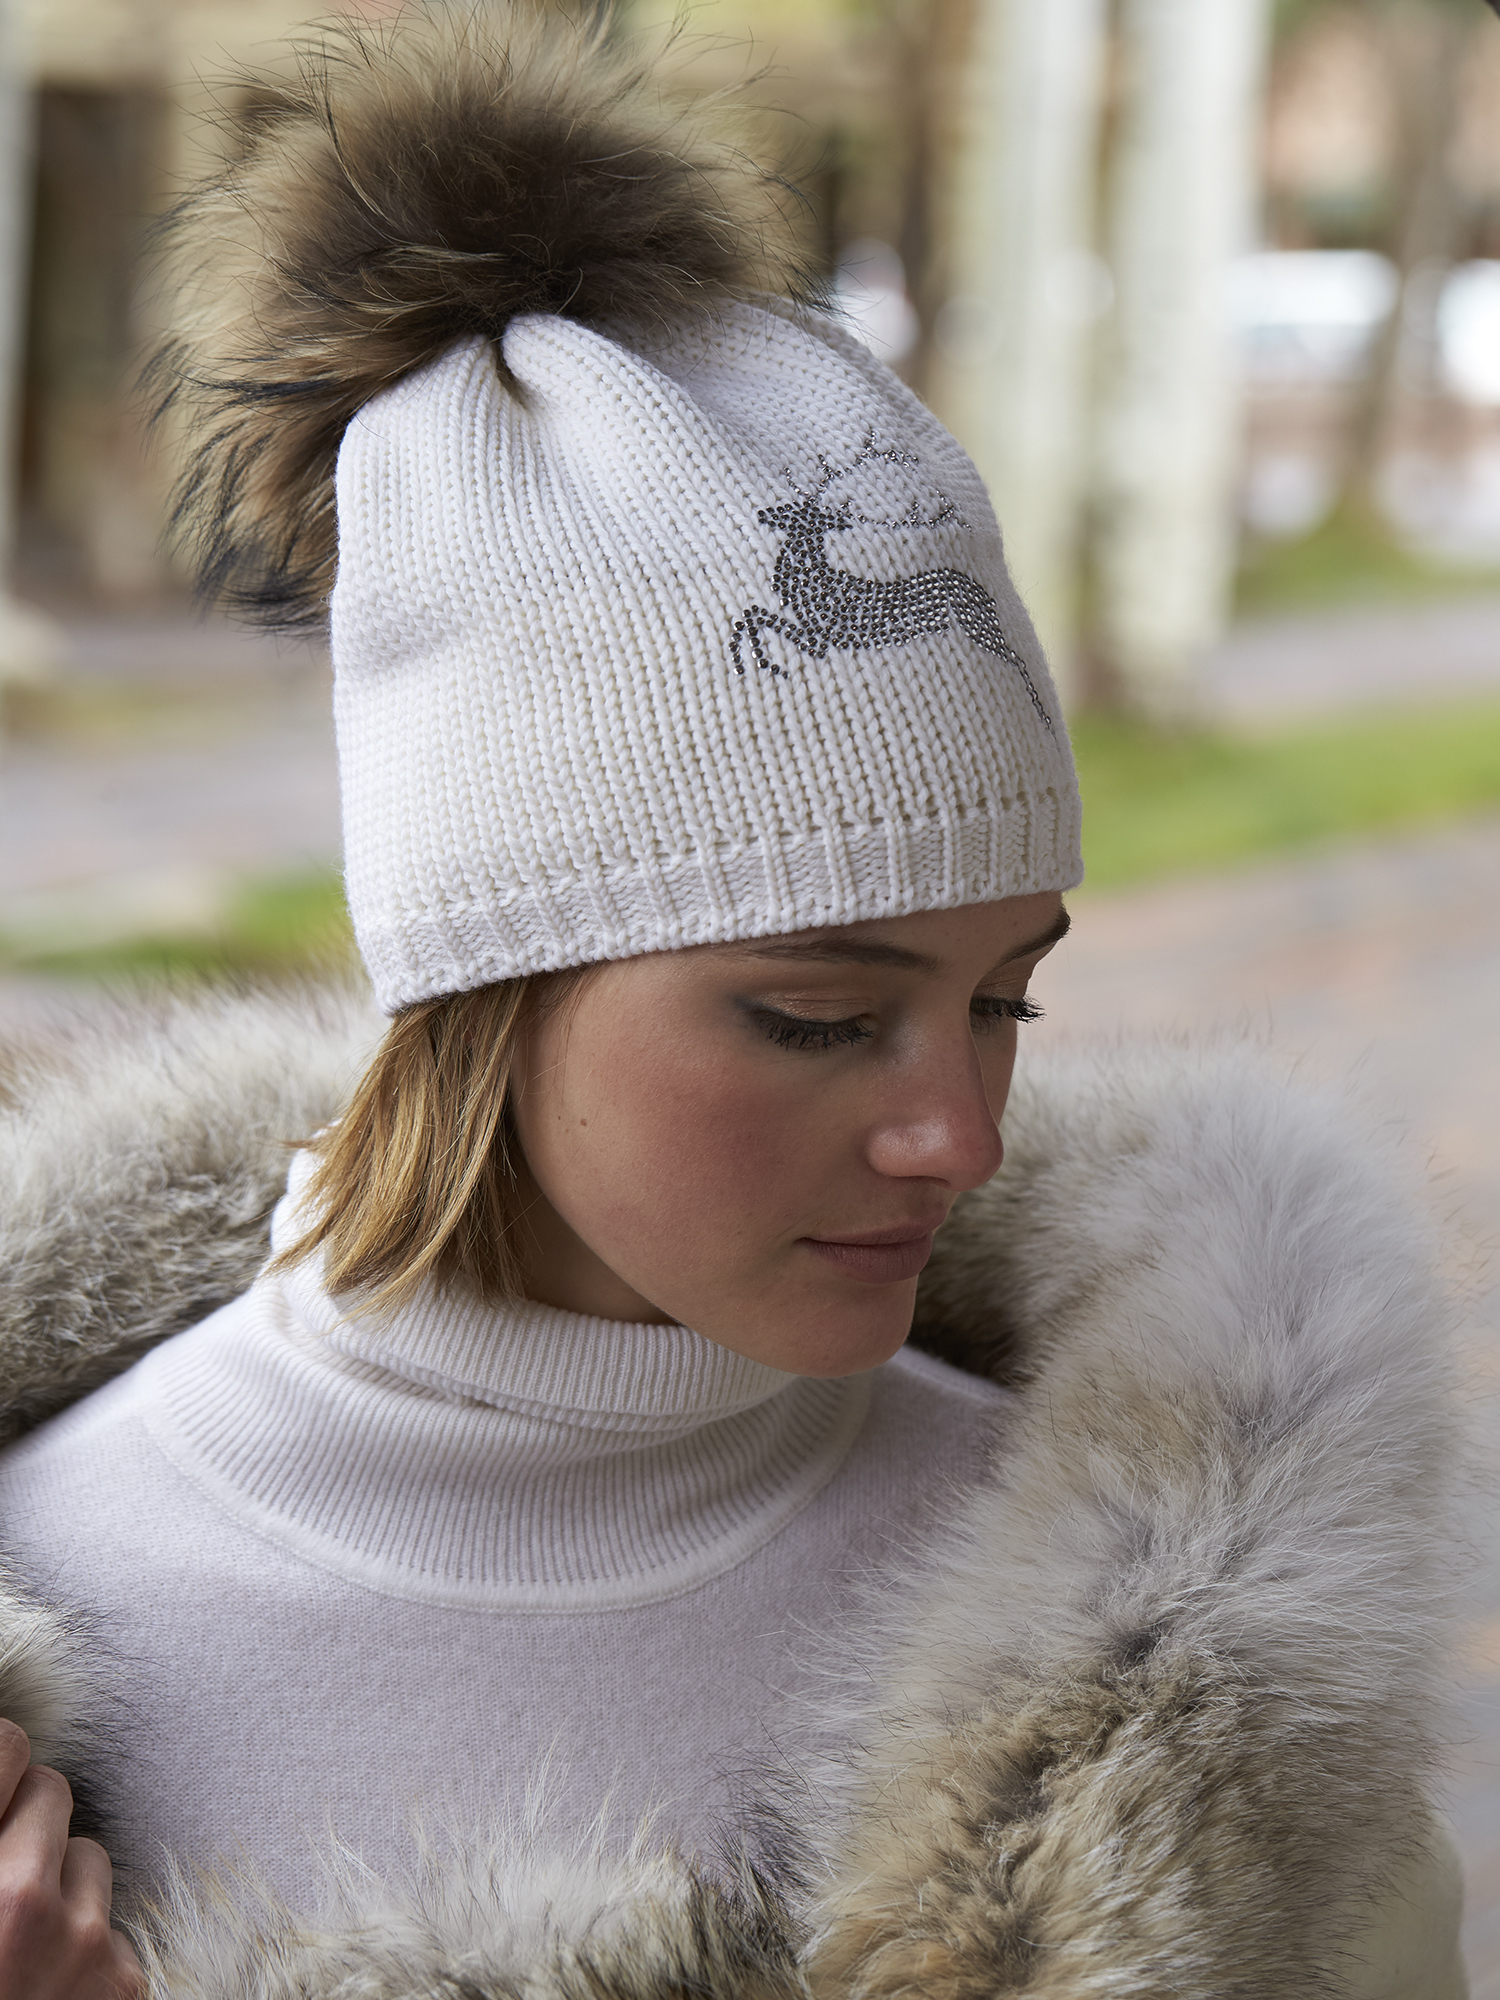 9a38a5e5fb6 Canada Goose Merino Wool Fleece Lined Beanie